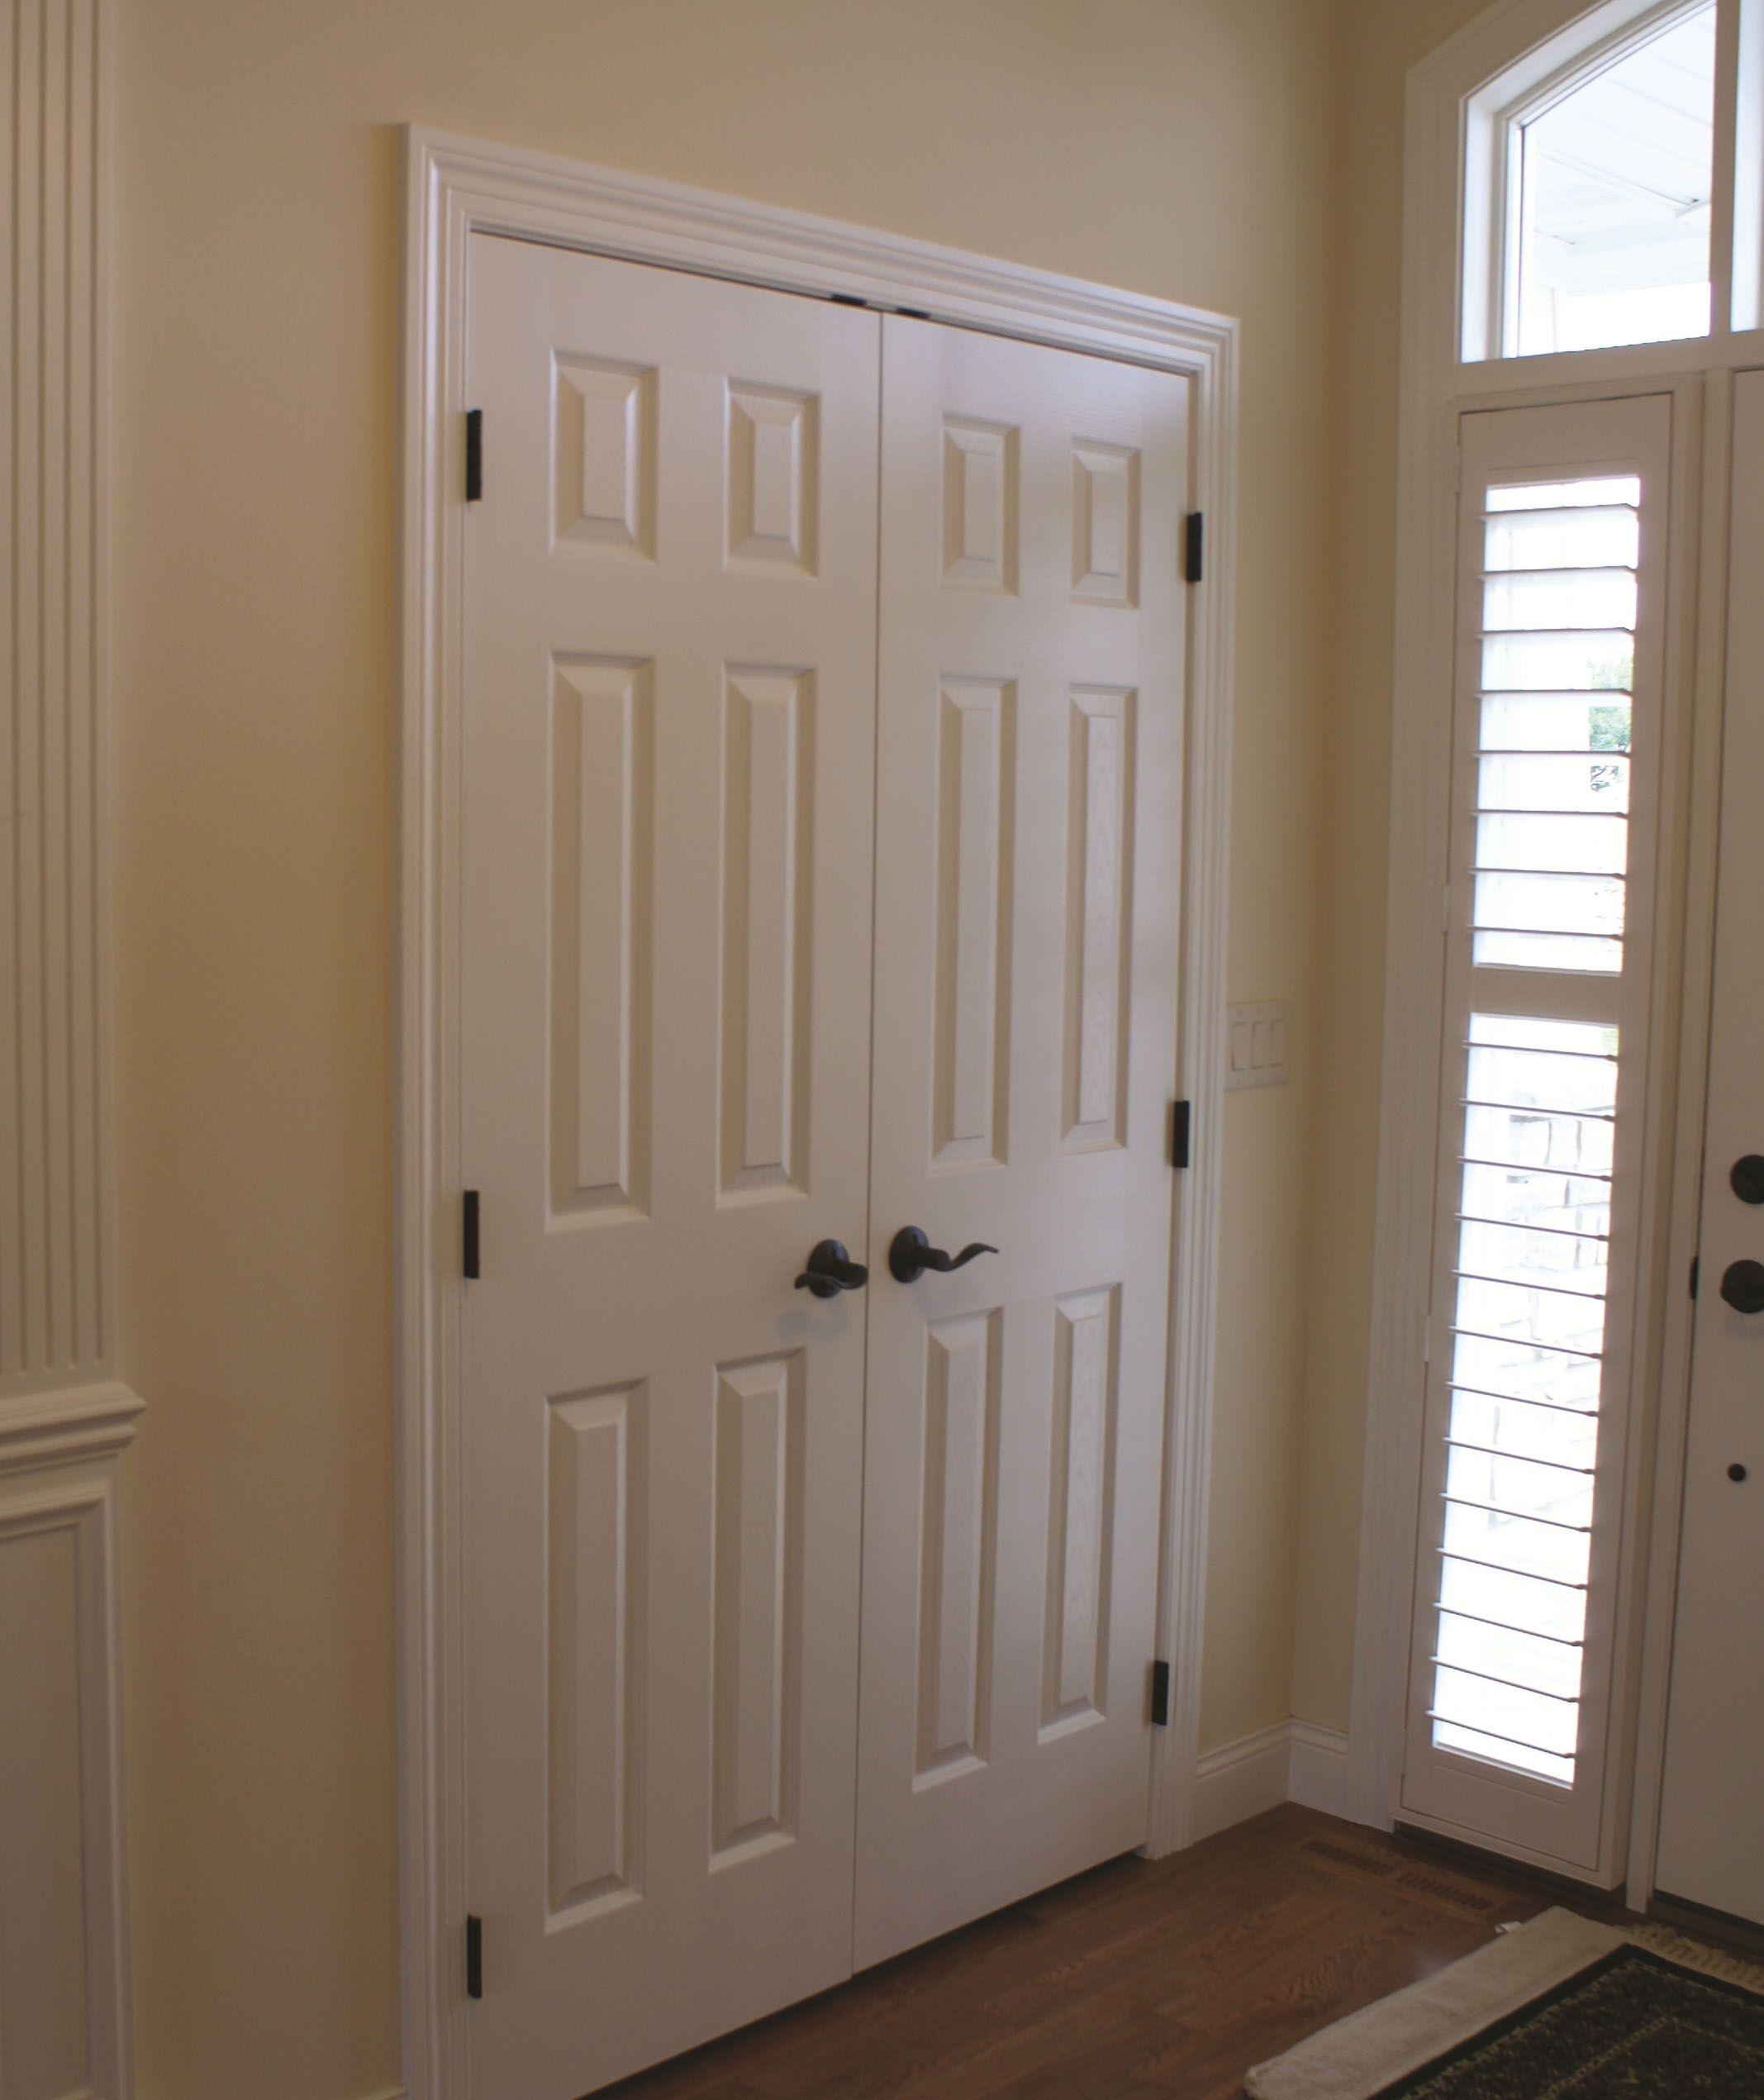 Primed Front Hall Closet Crop Jpg 2135 2541 Closet Doors Hall